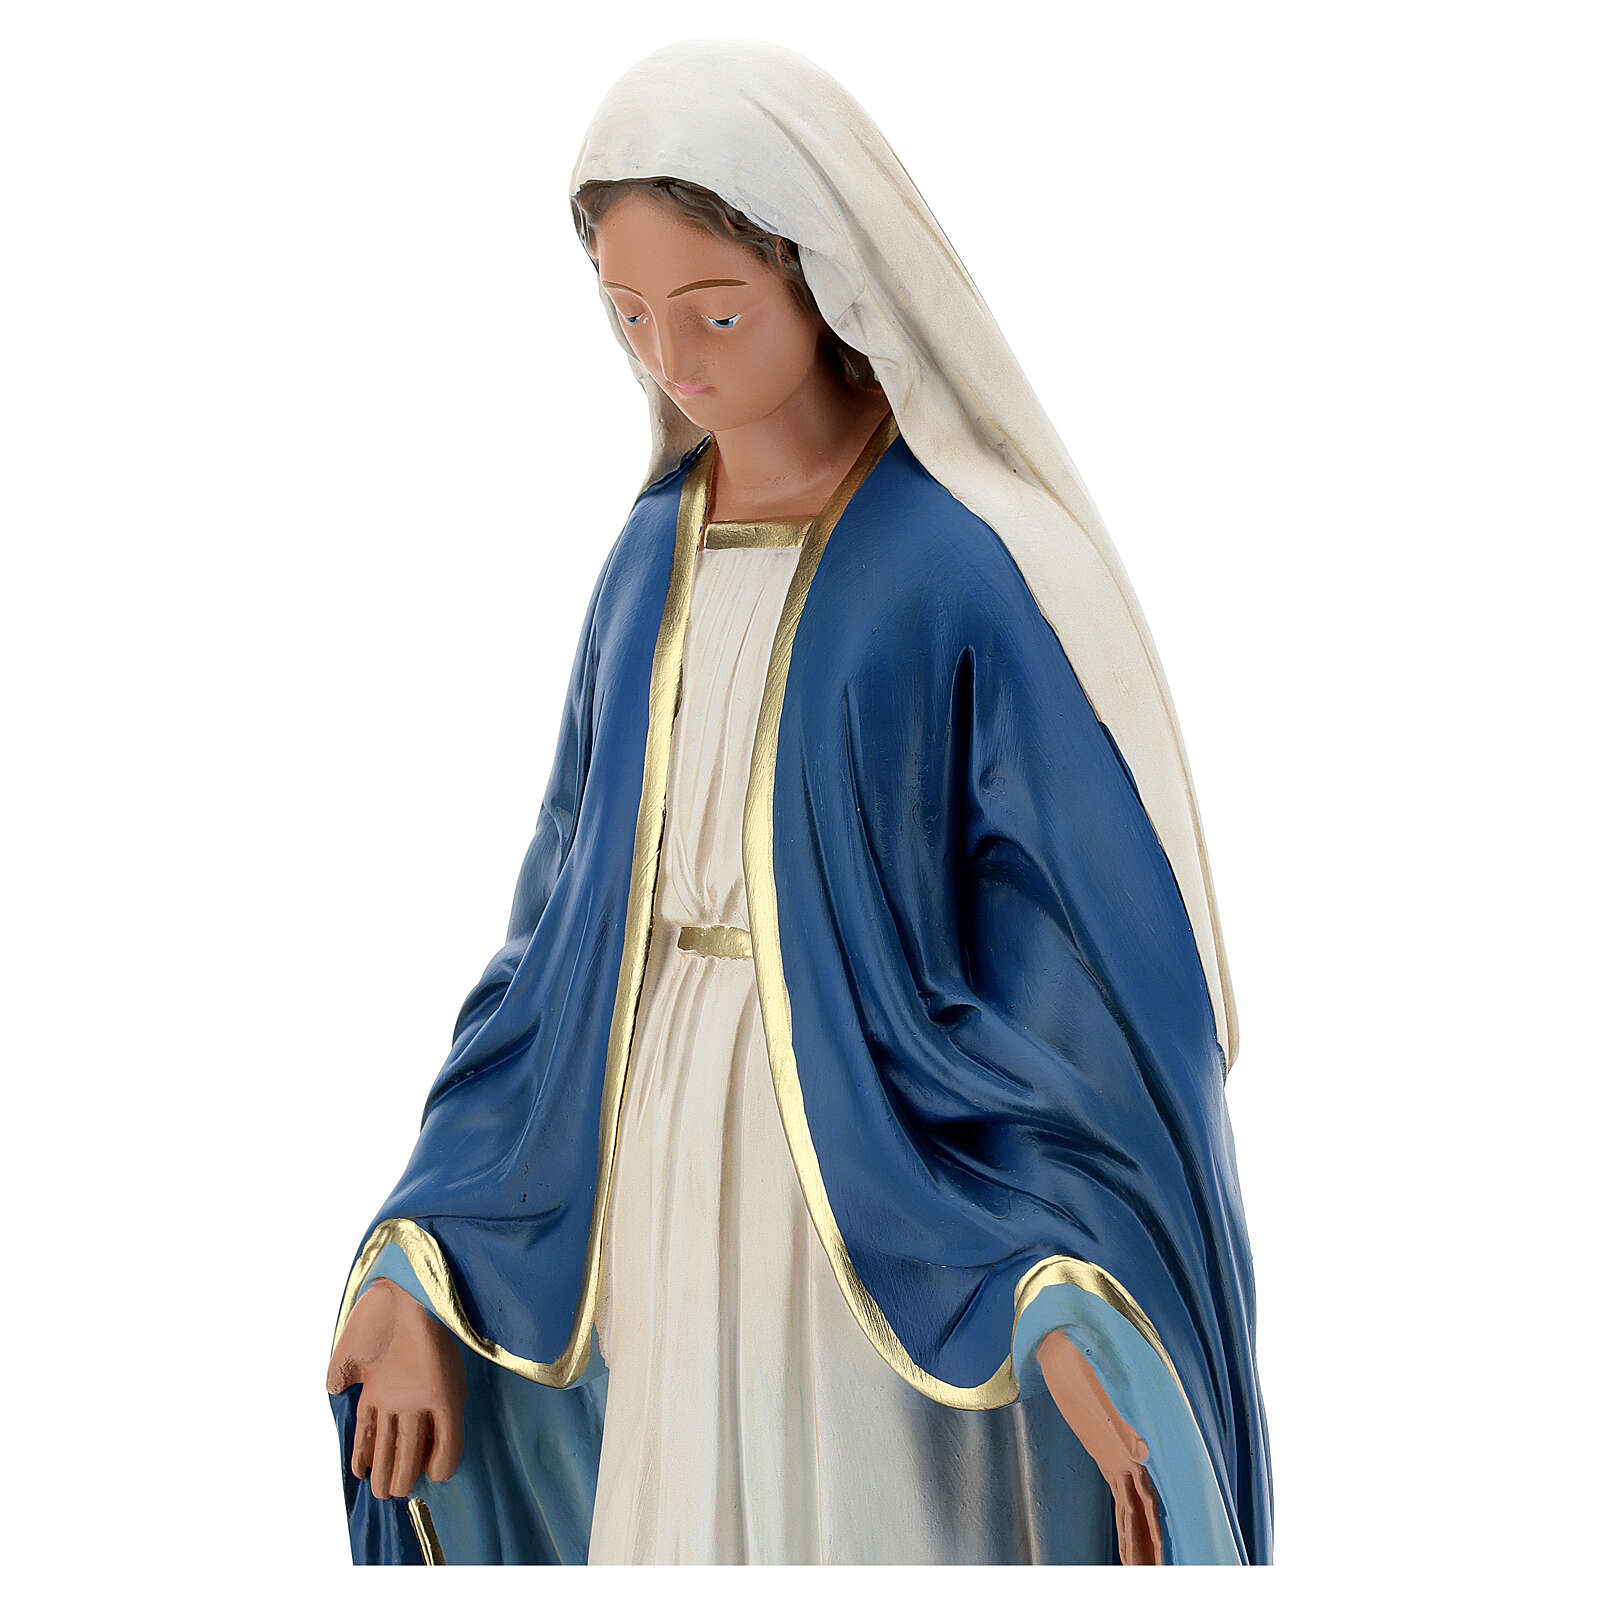 Virgen Inmaculada estatua 50 cm yeso pintado Barsanti 4